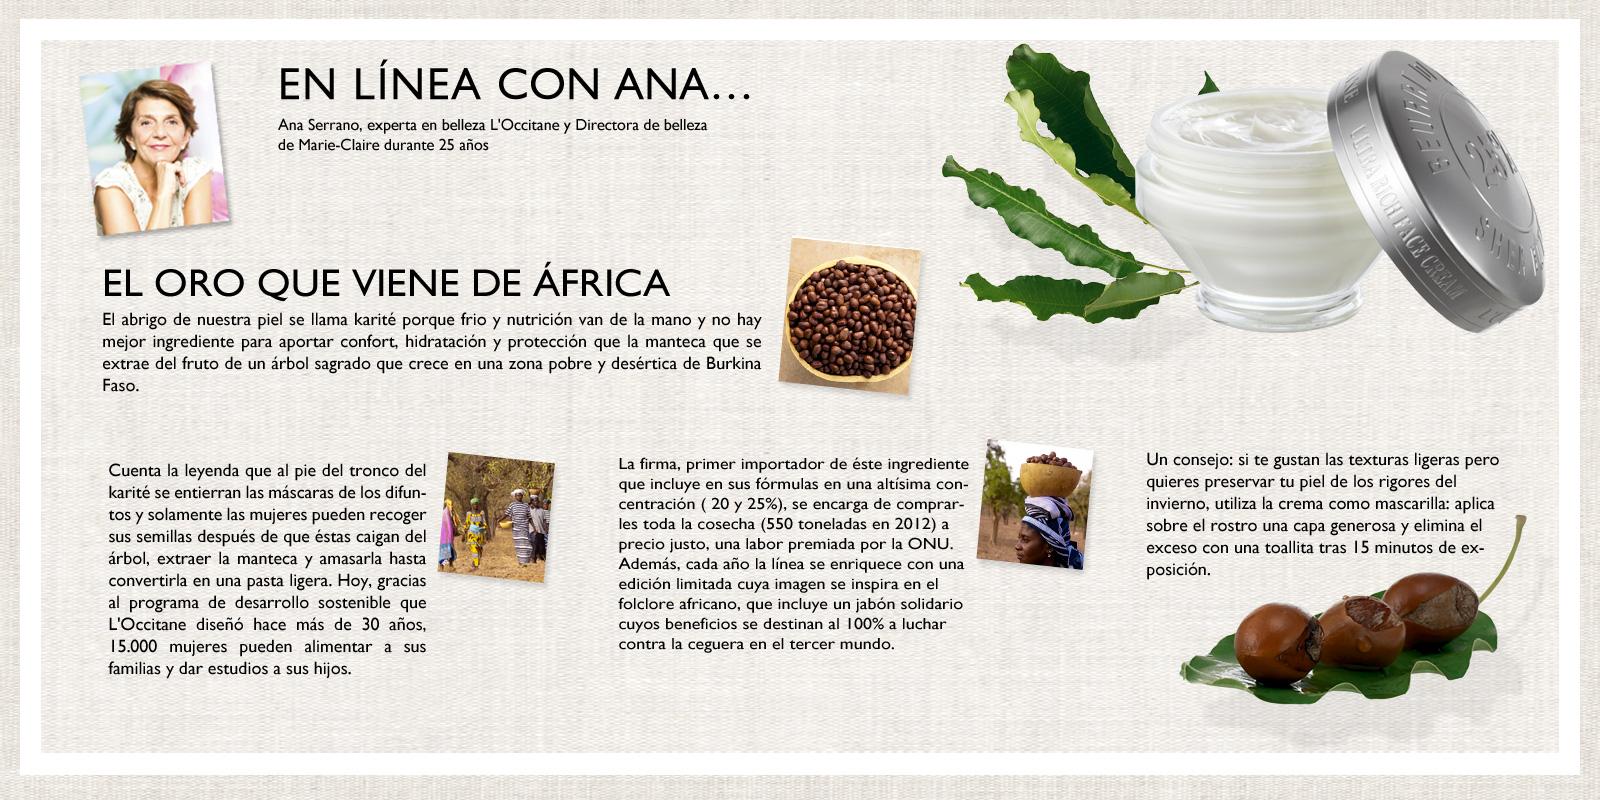 En linea con ana karite - L'Occitane en Provence espana